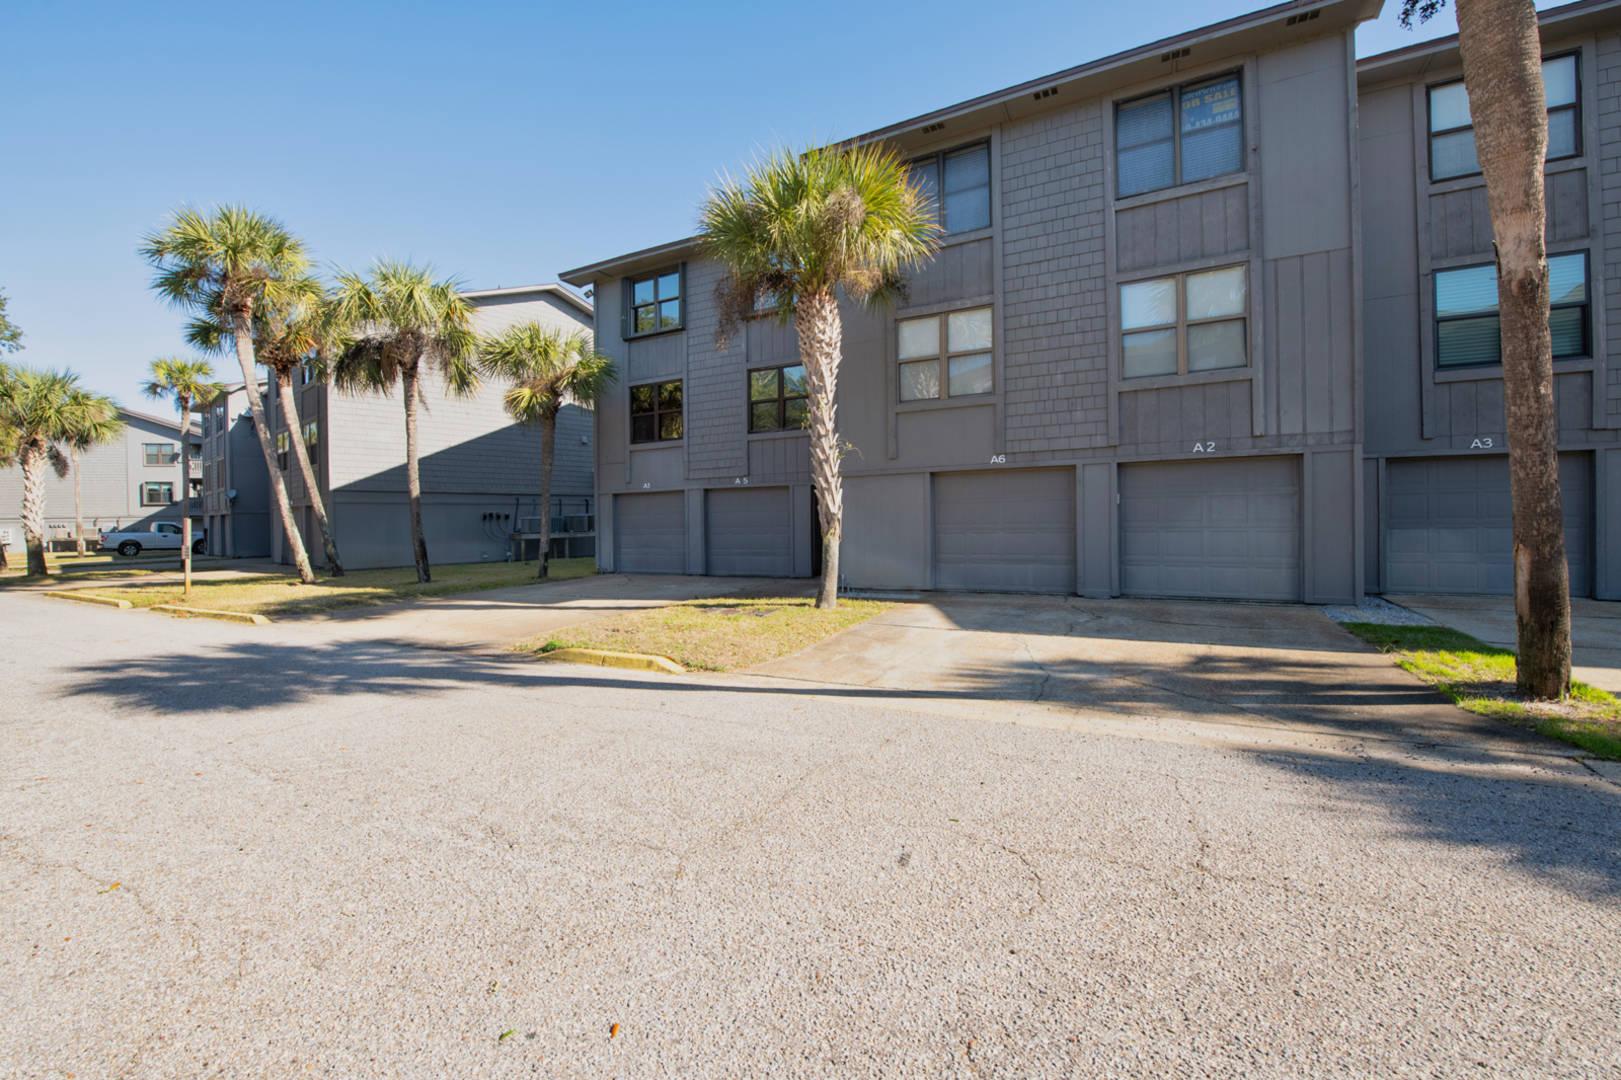 200 Pensacola Beach Rd, Unit A-2 Gulf Breeze, FL 32561